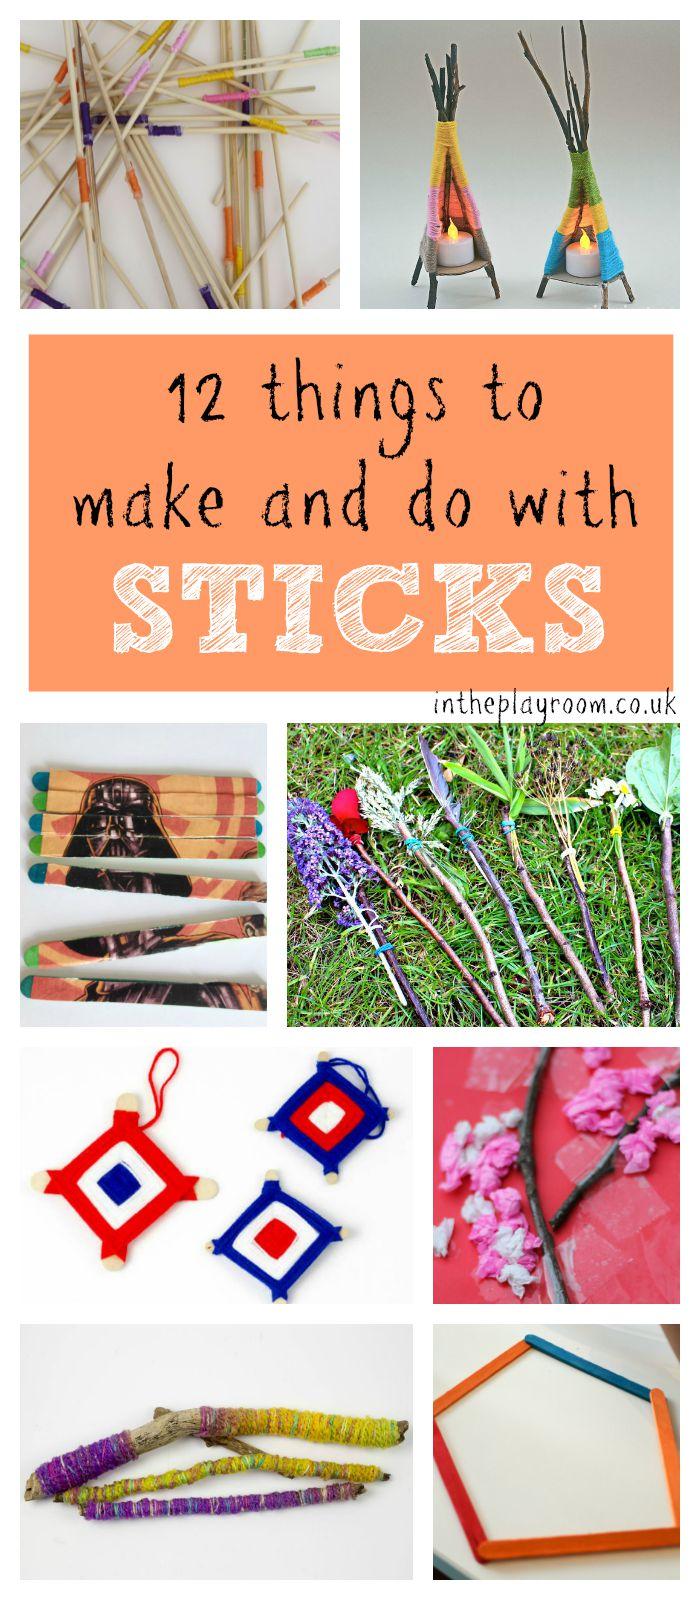 sticks-collage